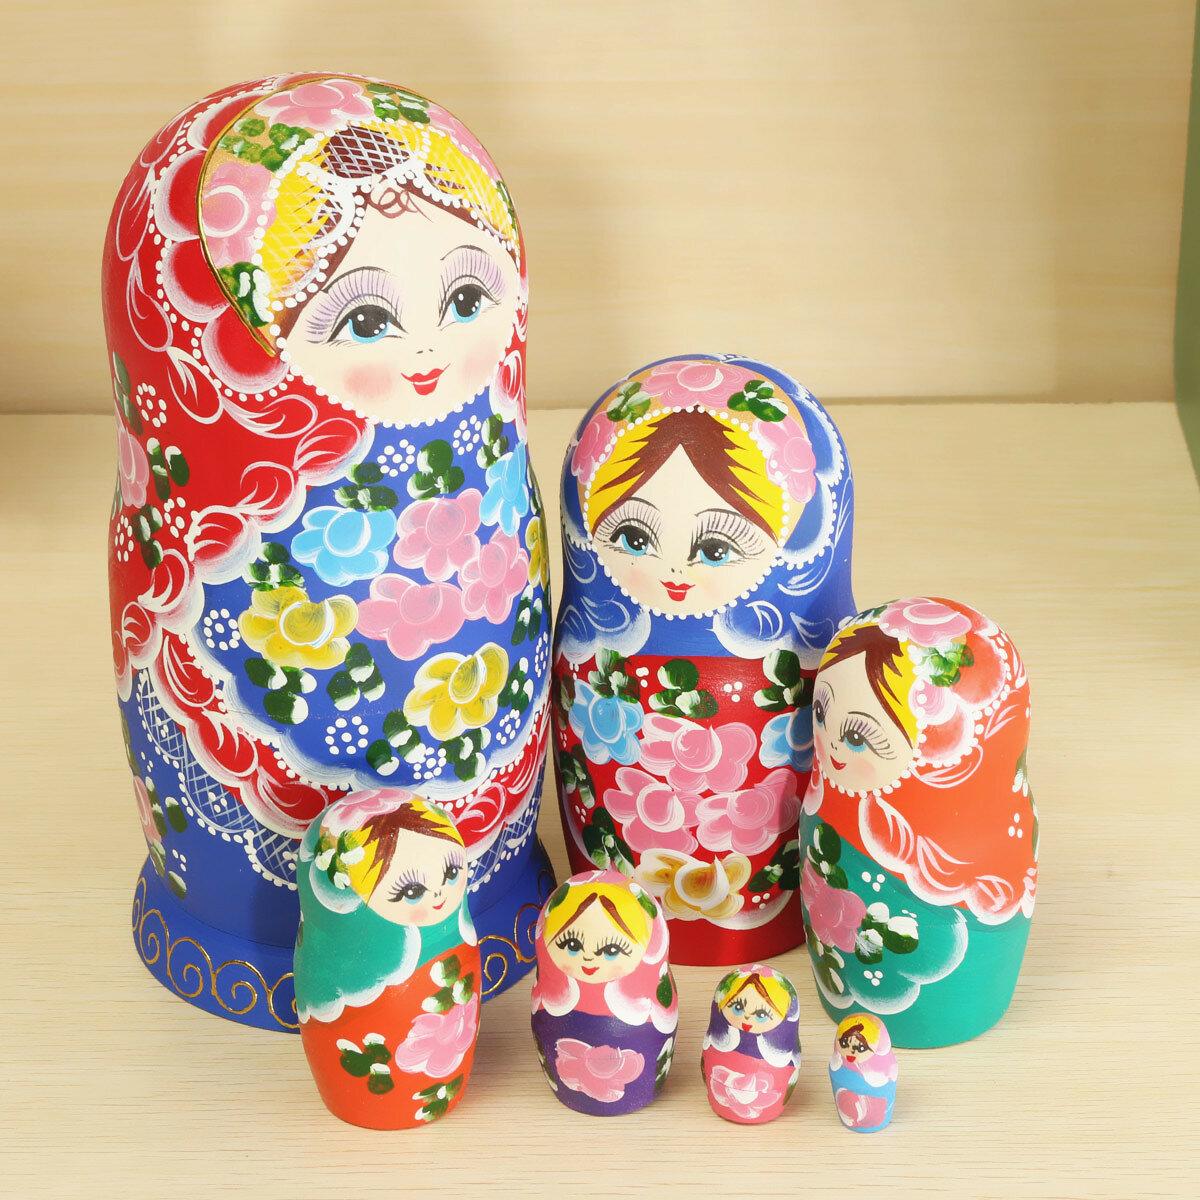 Matryoshka 7ネストドール狂気のセットロシア木製人形玩具